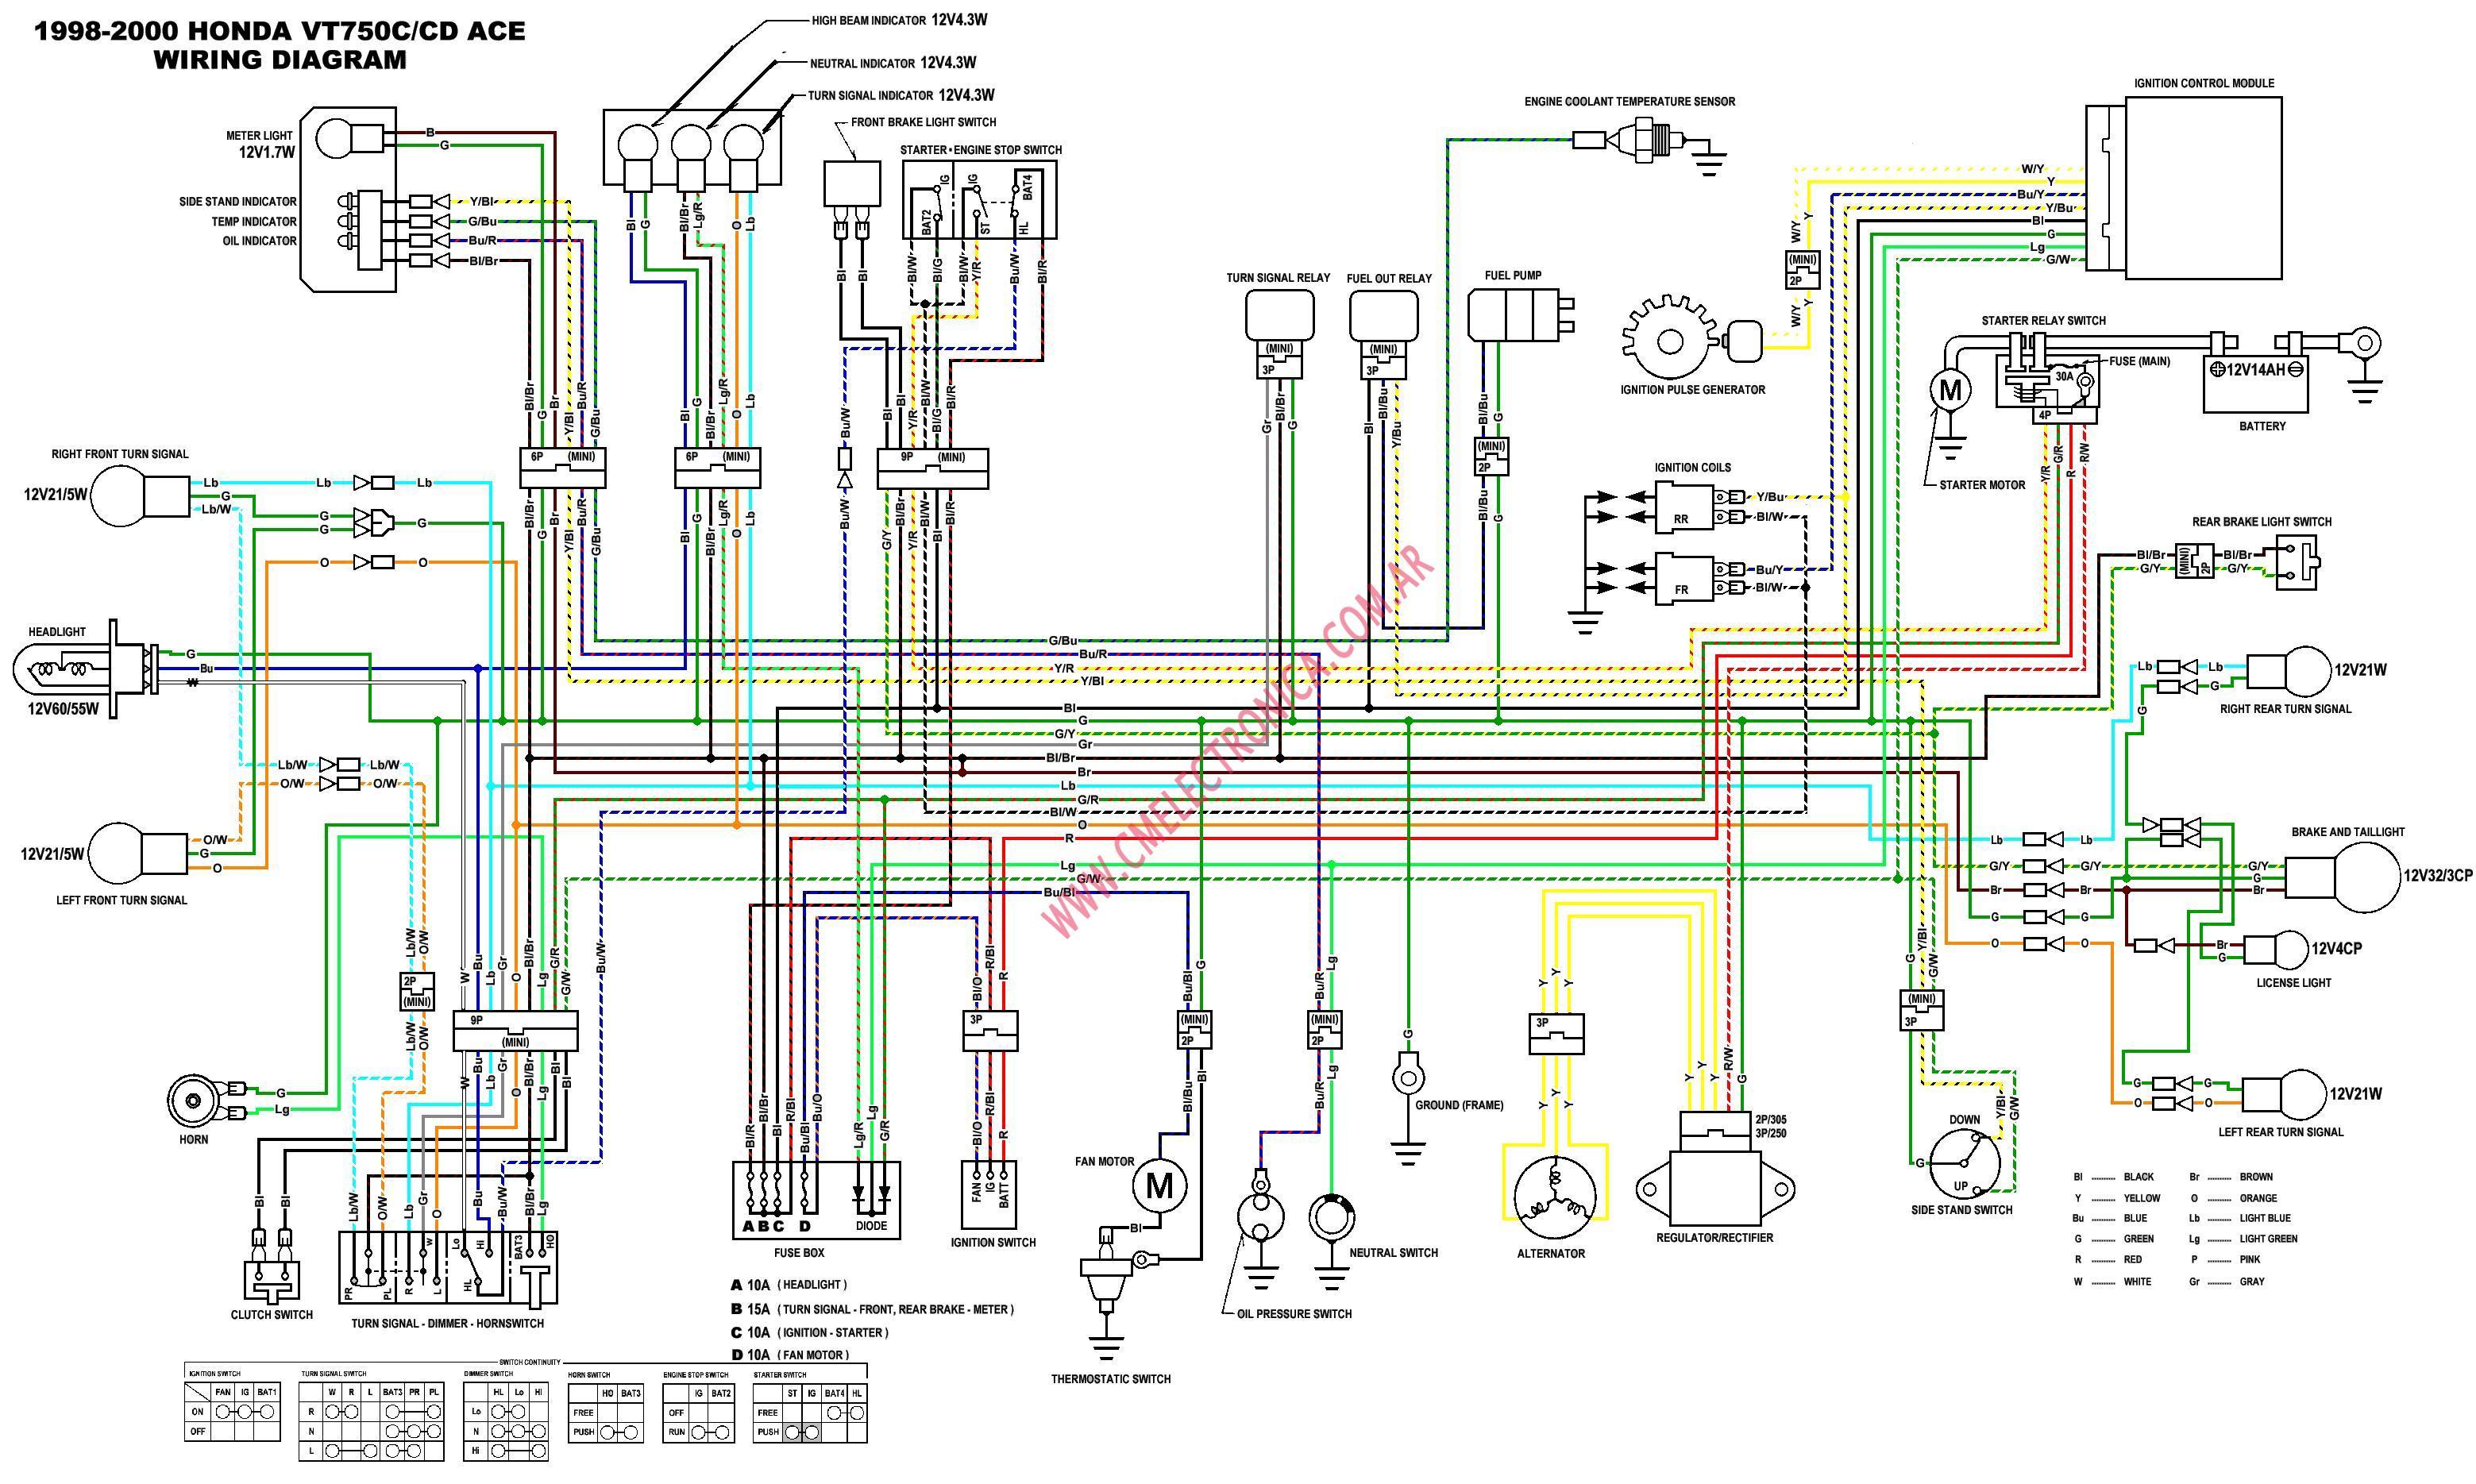 Tremendous Vt750 Wiring Diagram Wiring Diagram Data Wiring Cloud Gufailluminateatxorg